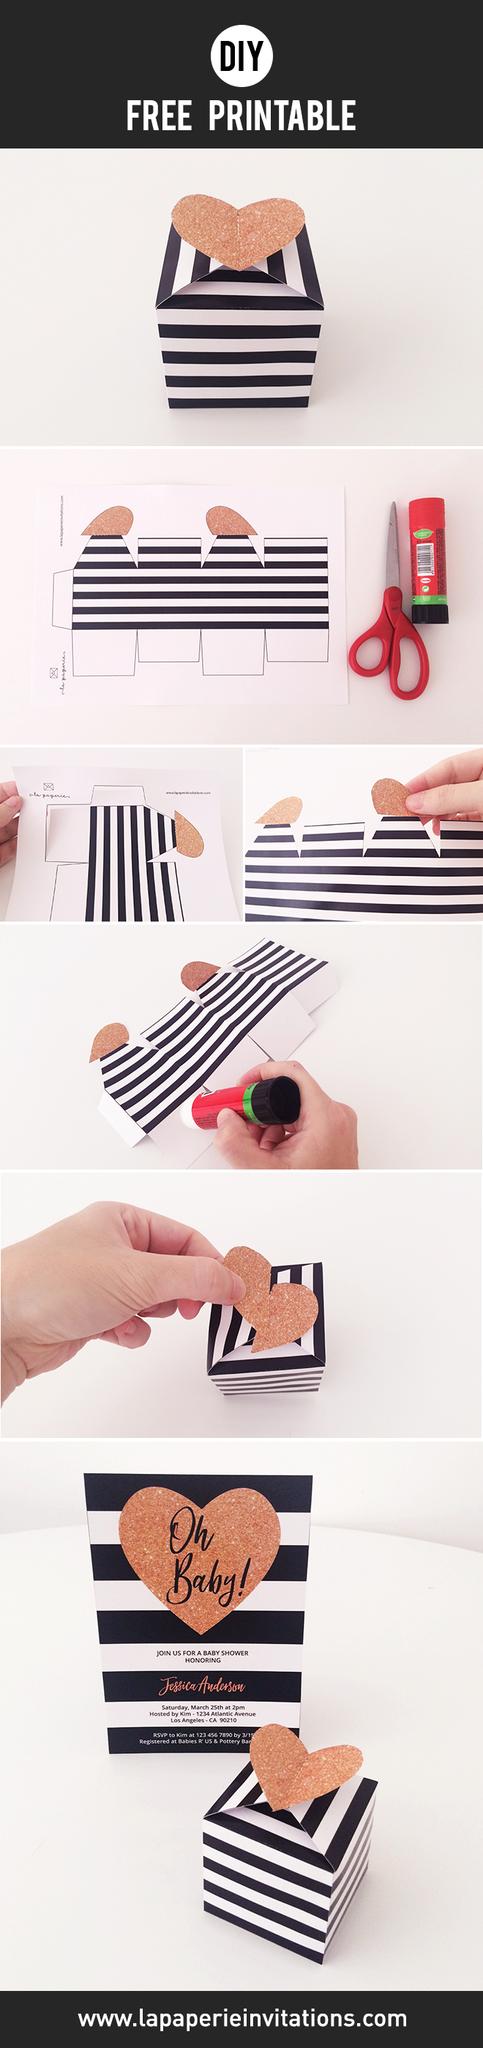 DIY Free Printable Favor Box | DIY Party Craft | Pinterest | Free ...